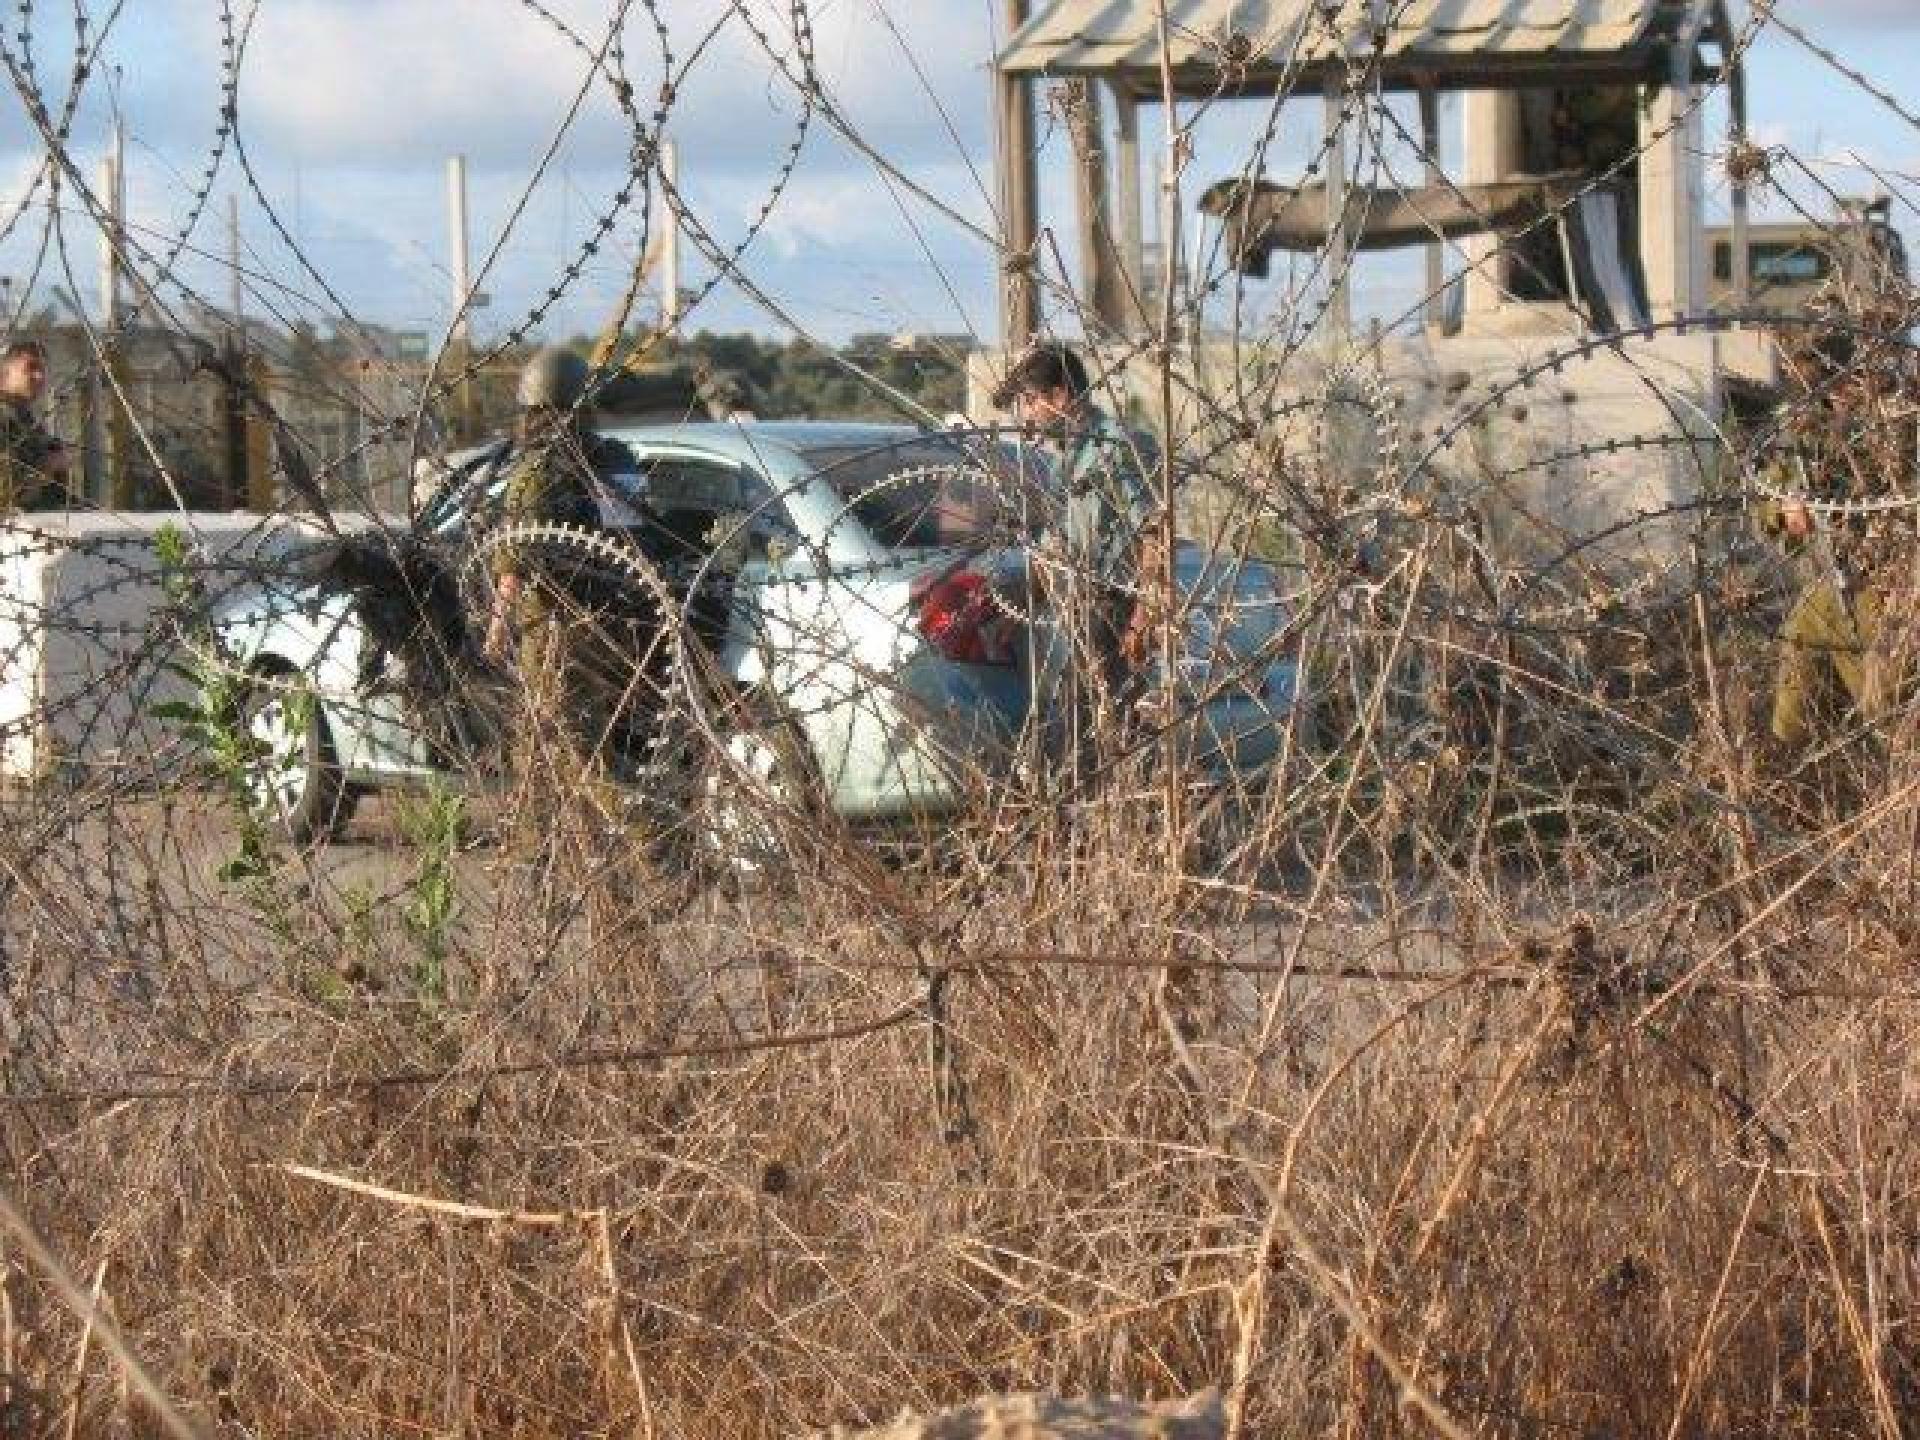 Tura/Shaked checkpoint 24.09.11